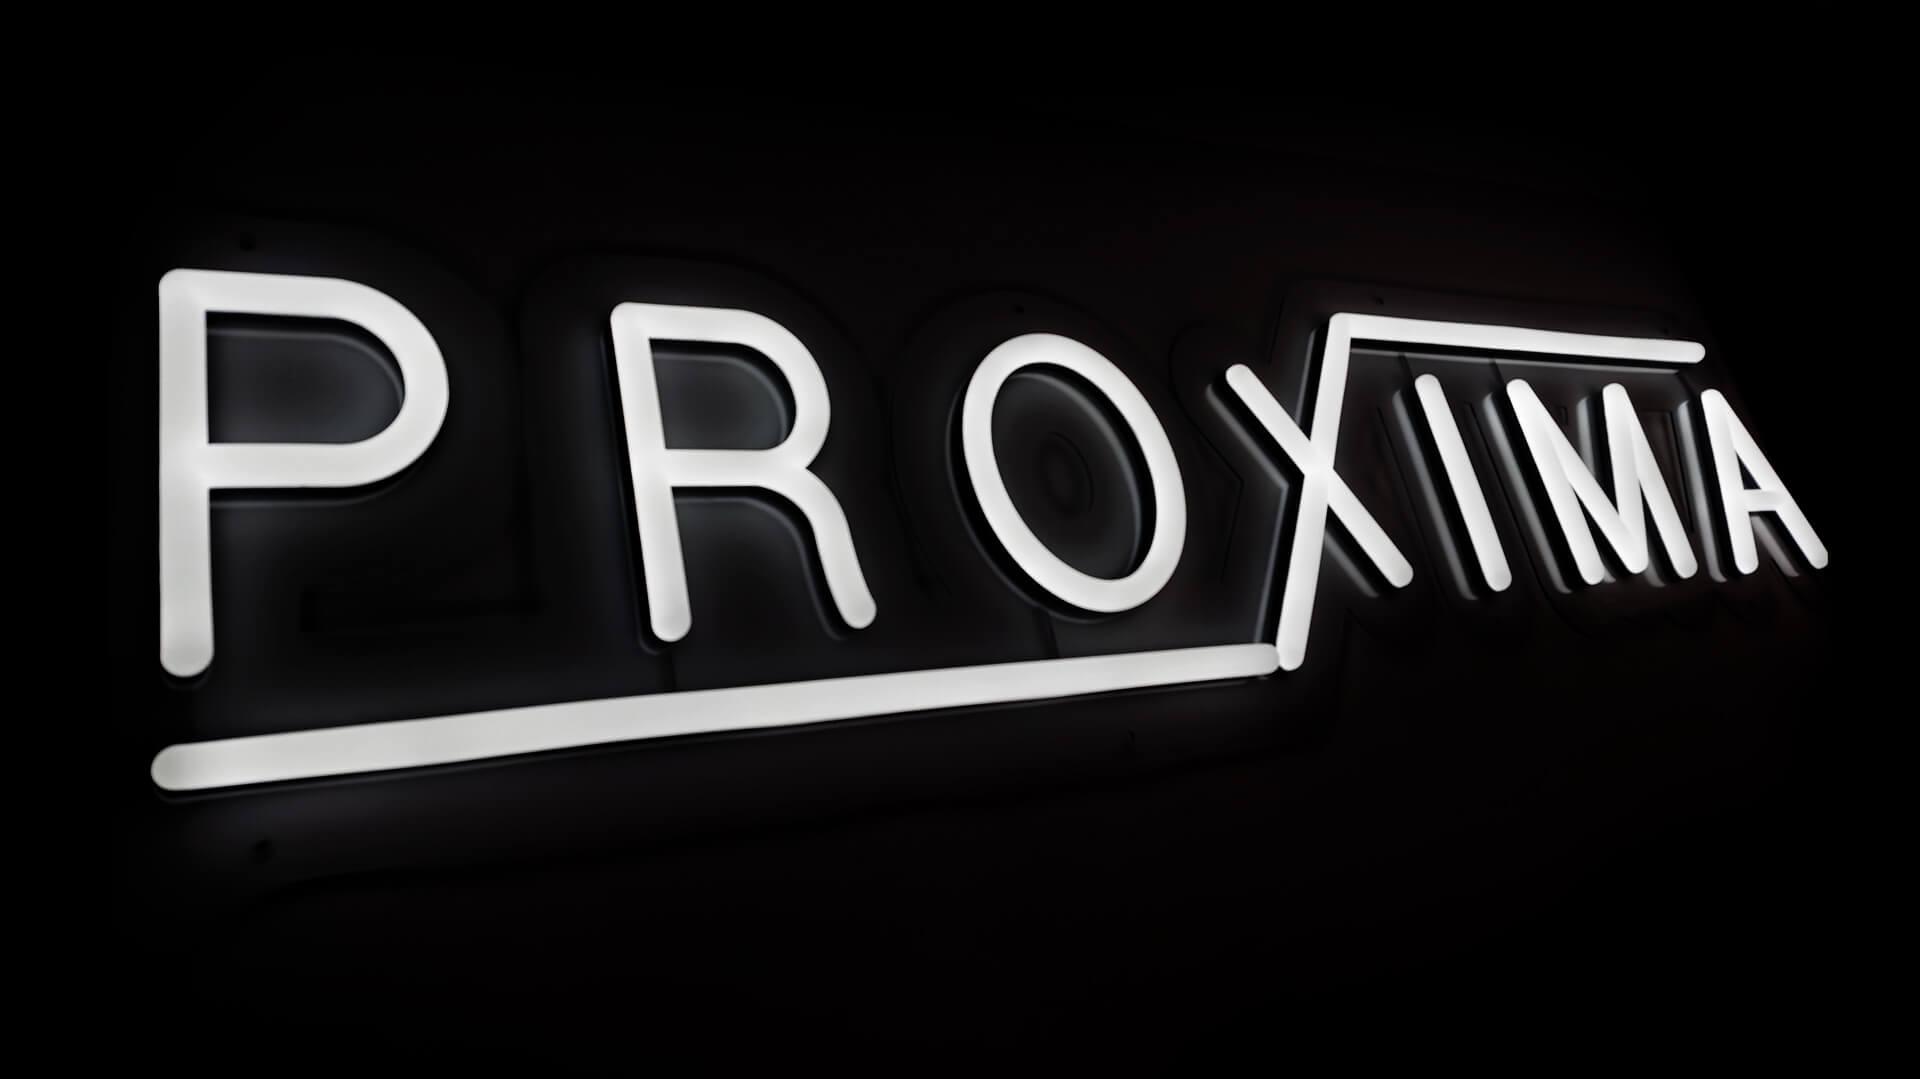 Beautiful creative shot of the custom neon sign